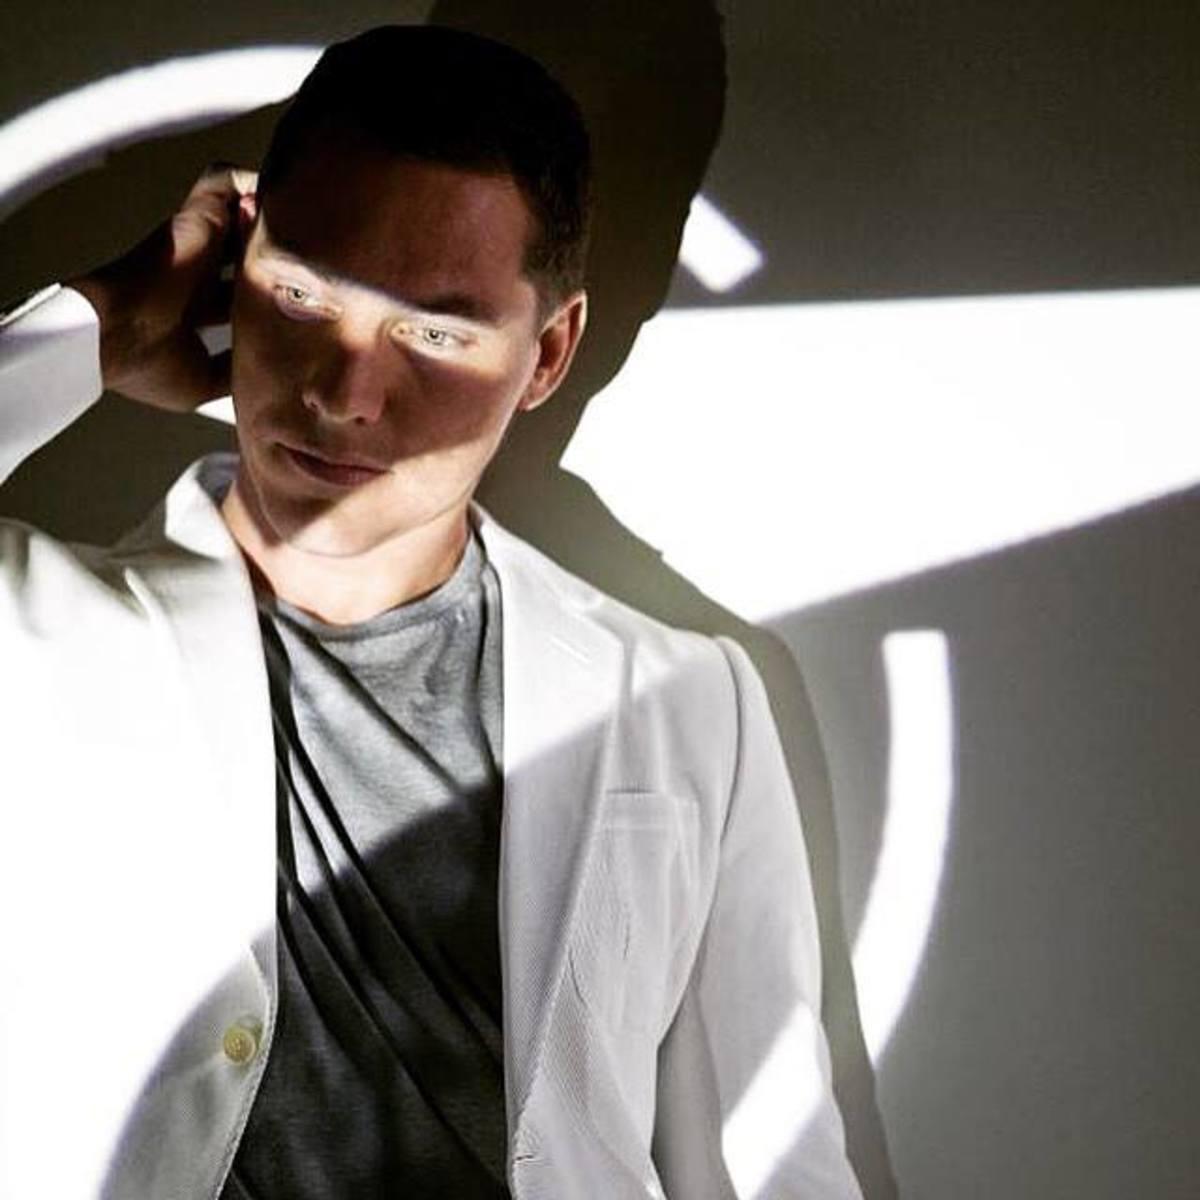 Tiesto Returns To Trance On New Single